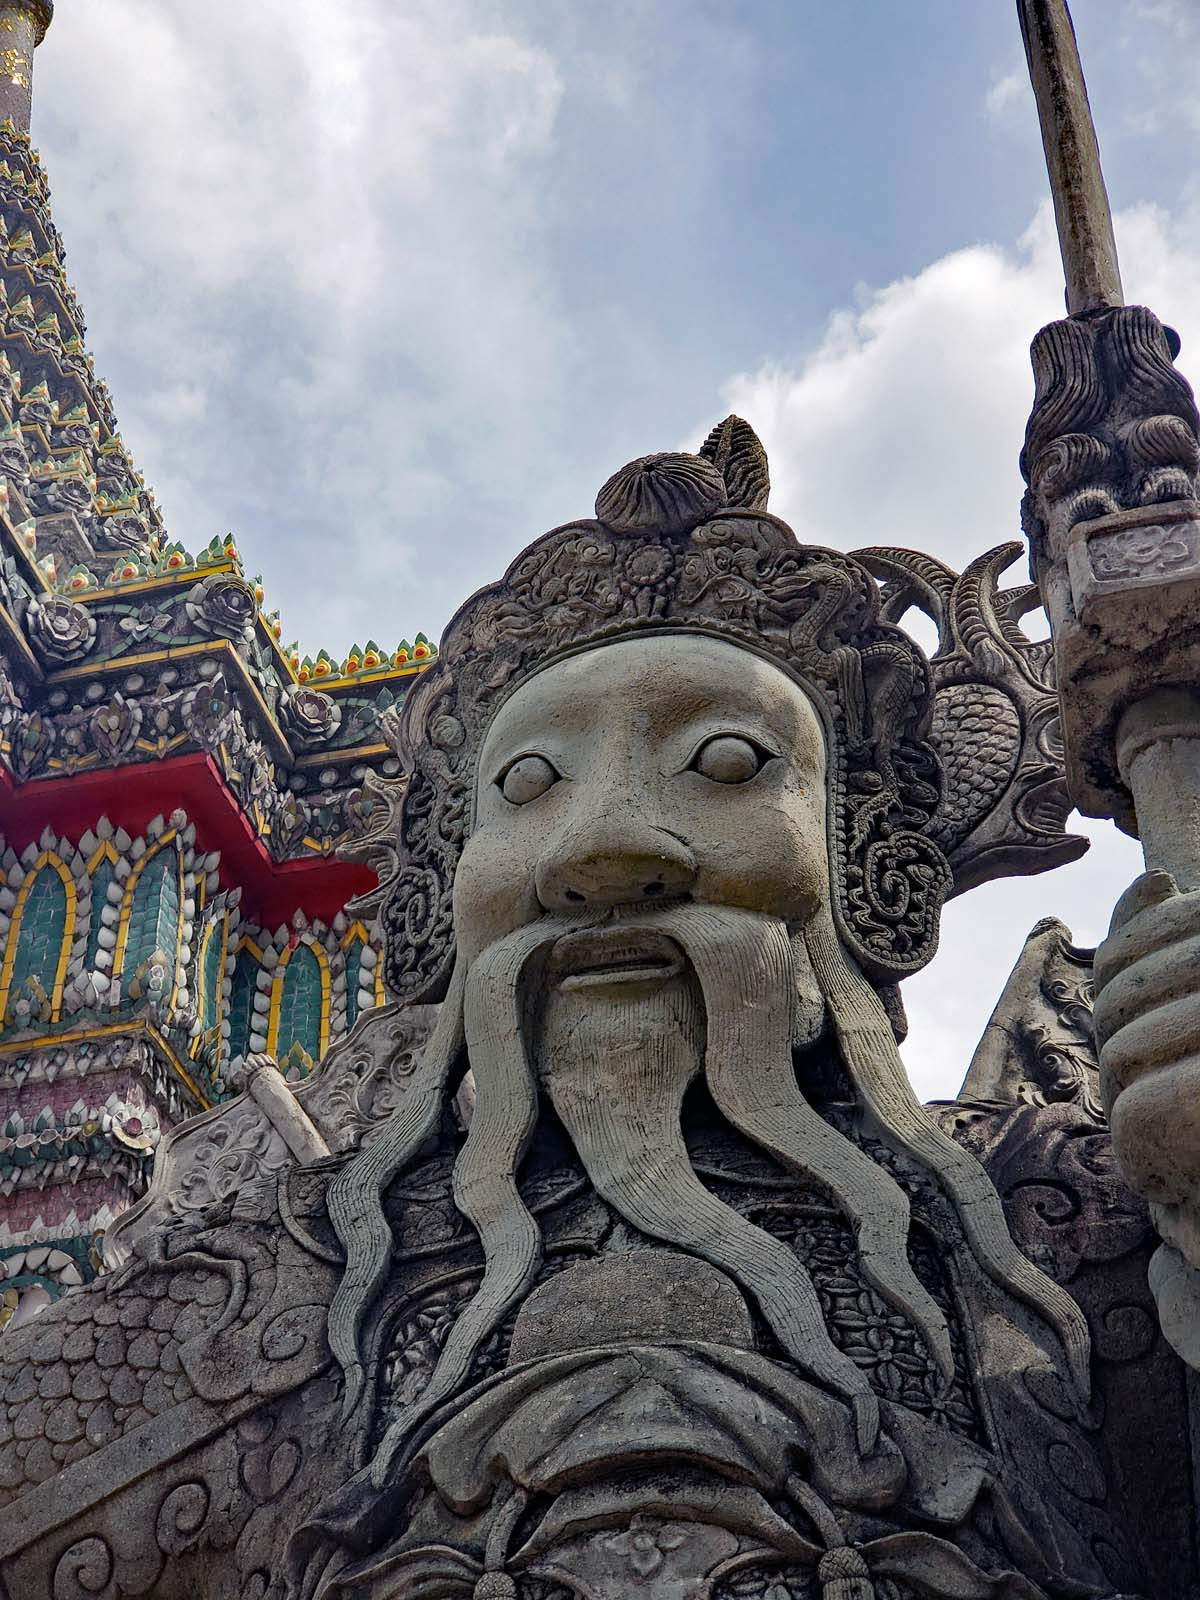 Warrior statue at Wat Pho